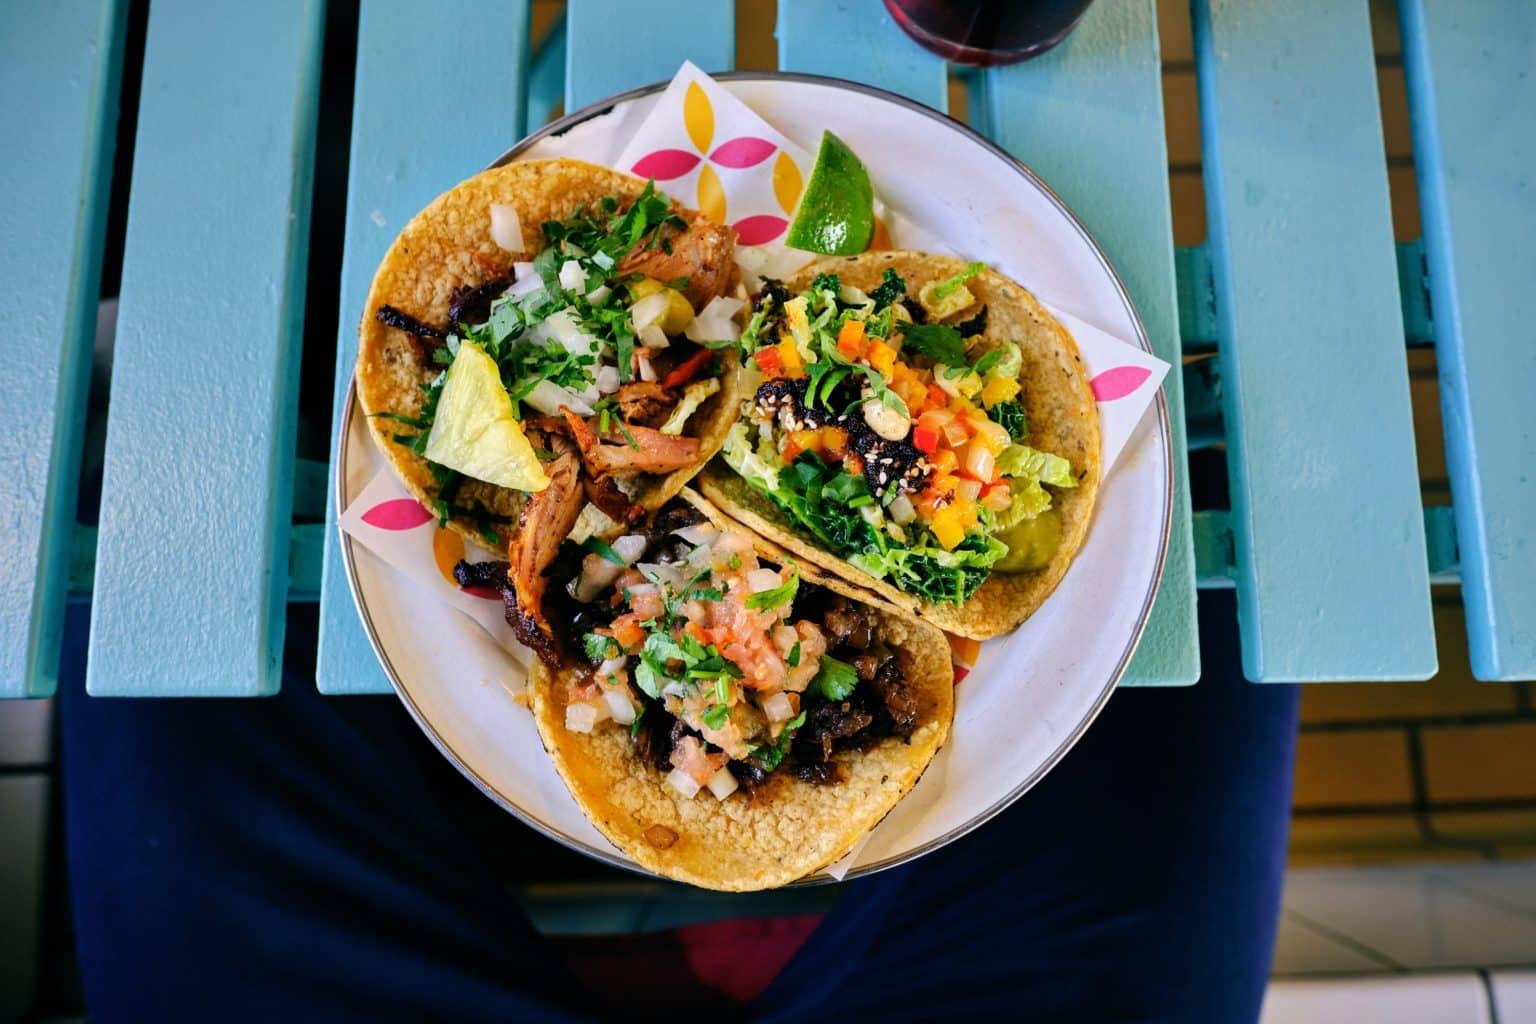 Image d'un plat de tacos mexicain